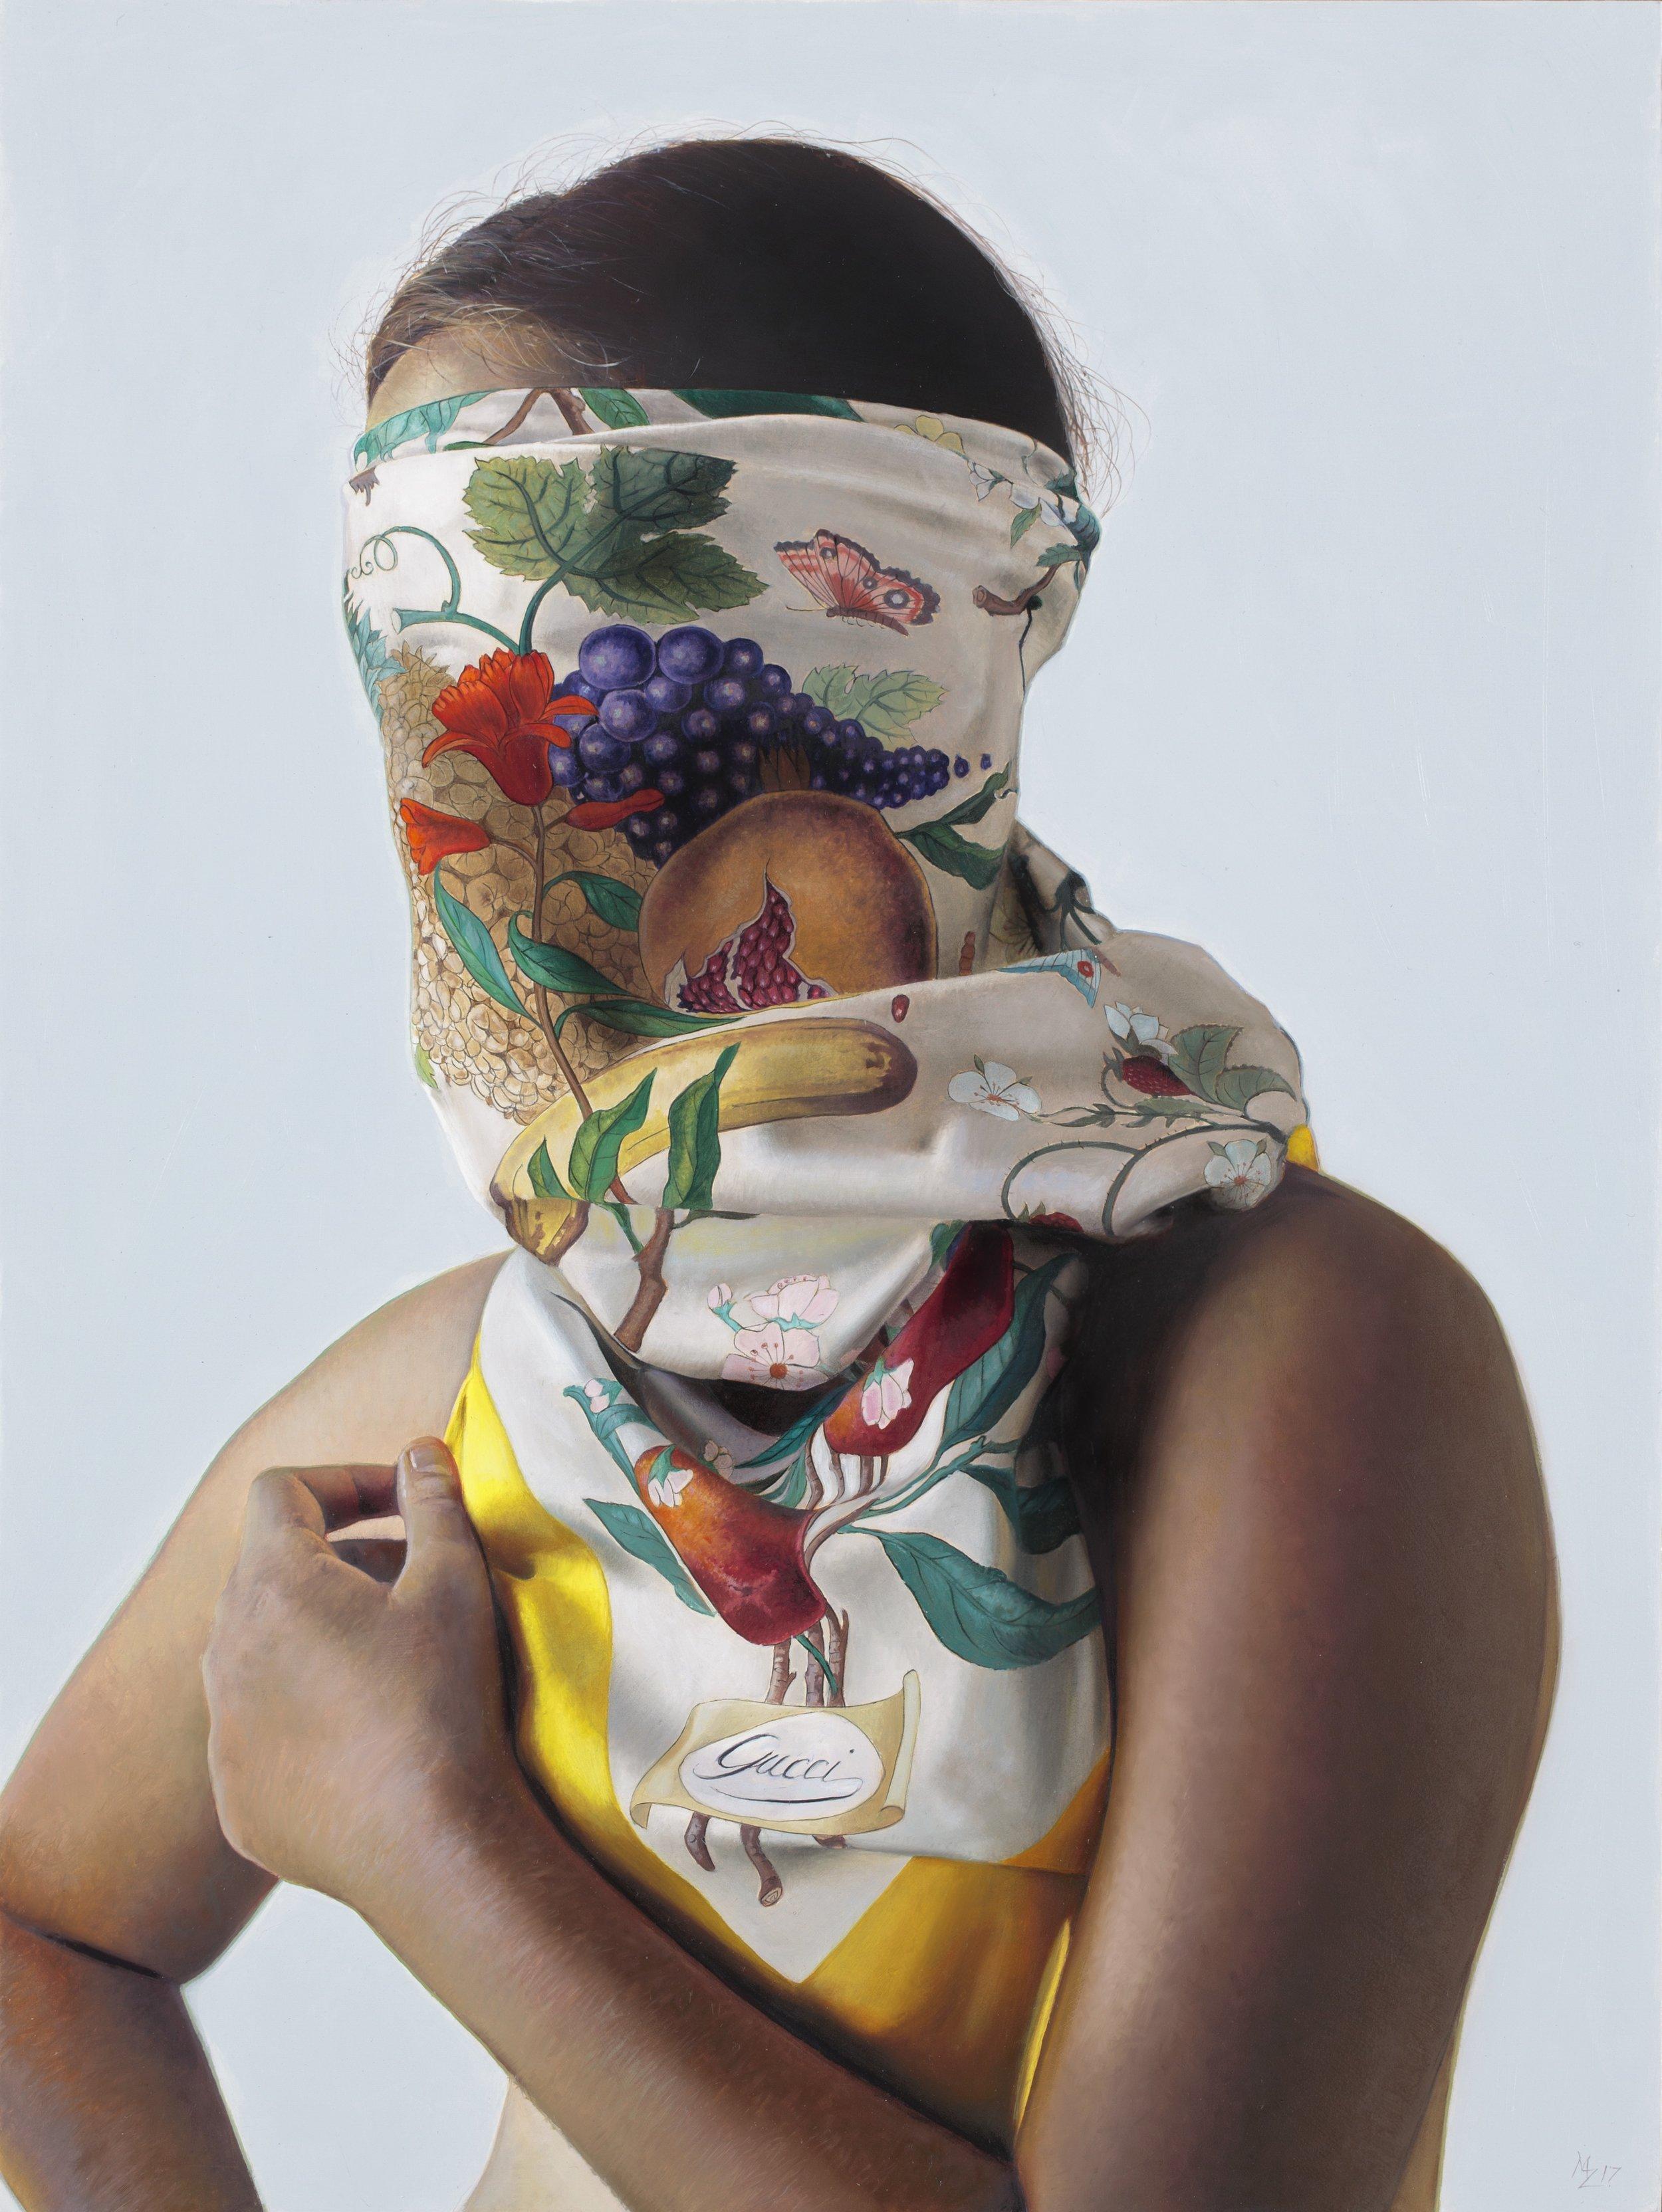 Michael Zavros, Summer Fruits, 2017, oil on aluminum, 400 x 300 mm